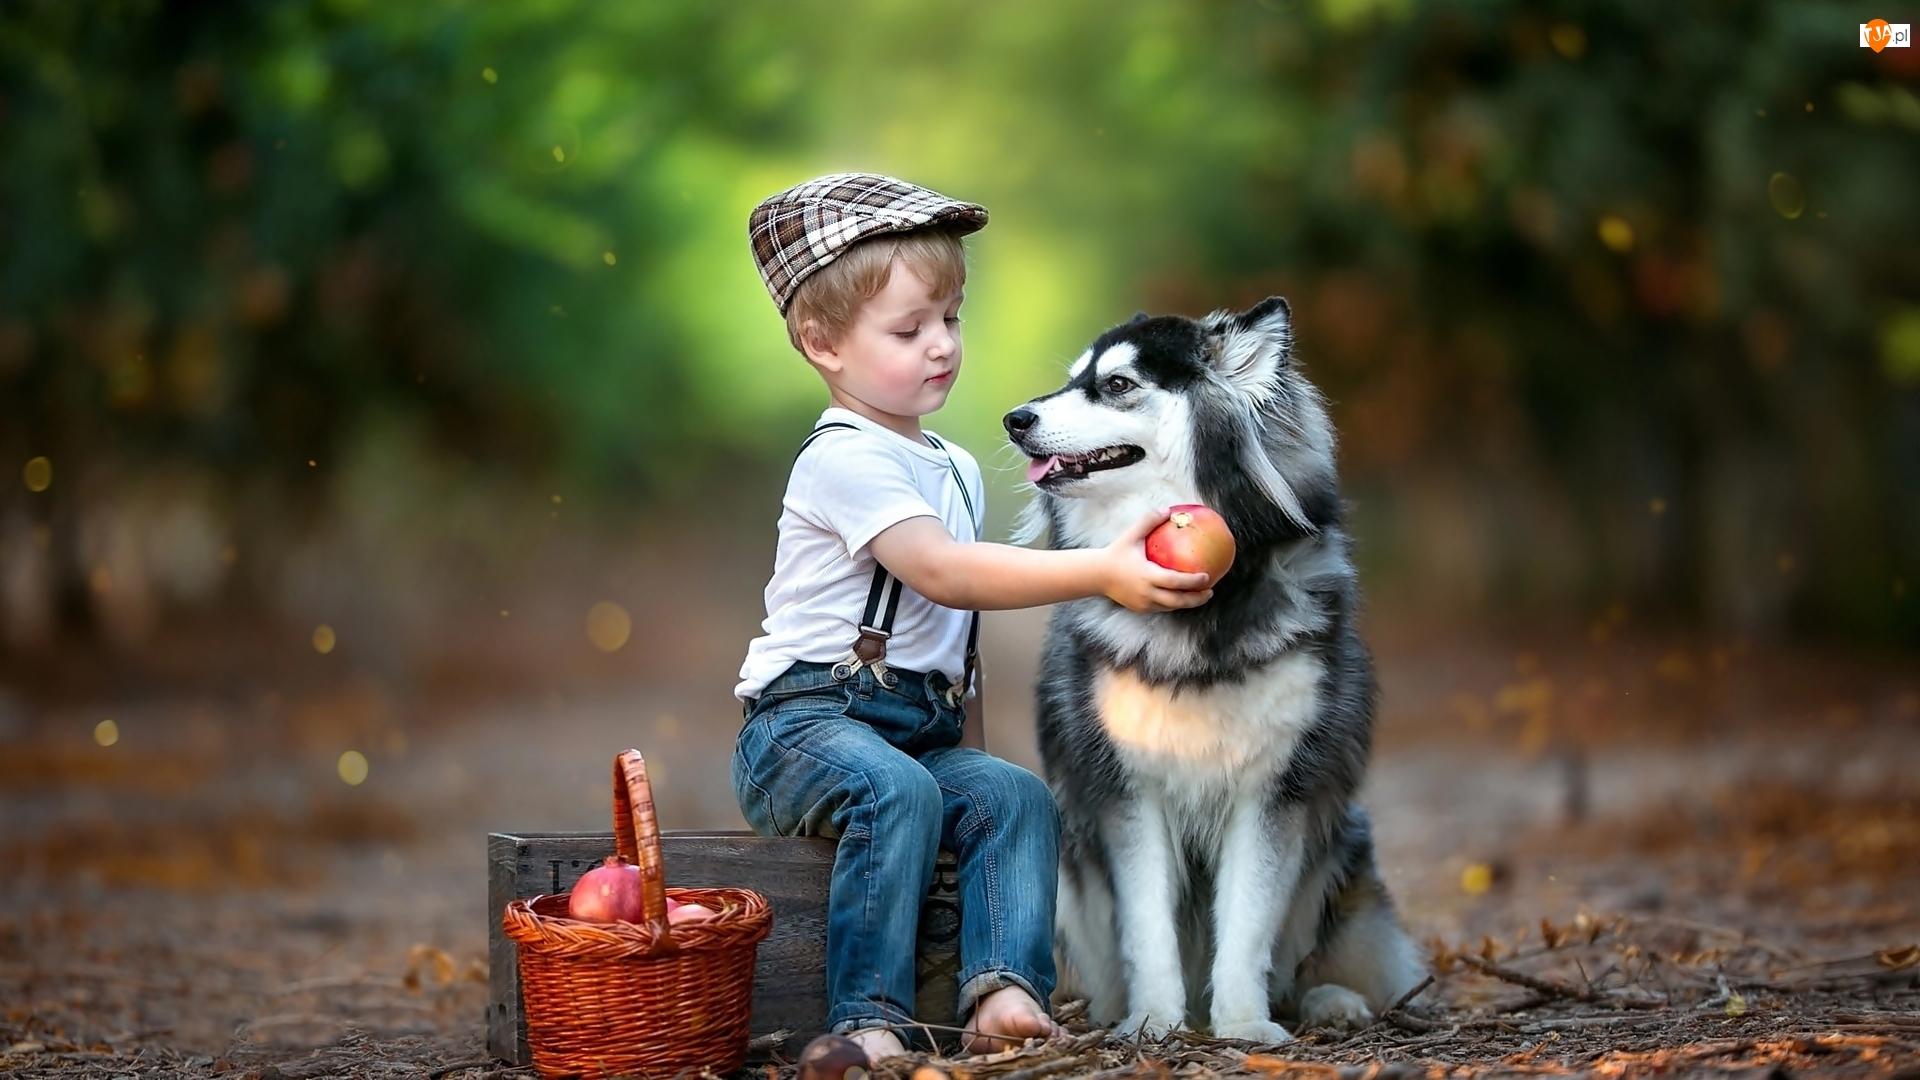 Droga, Koszyk, Pies, Chłopiec, Las, Siberian husky, Owoce